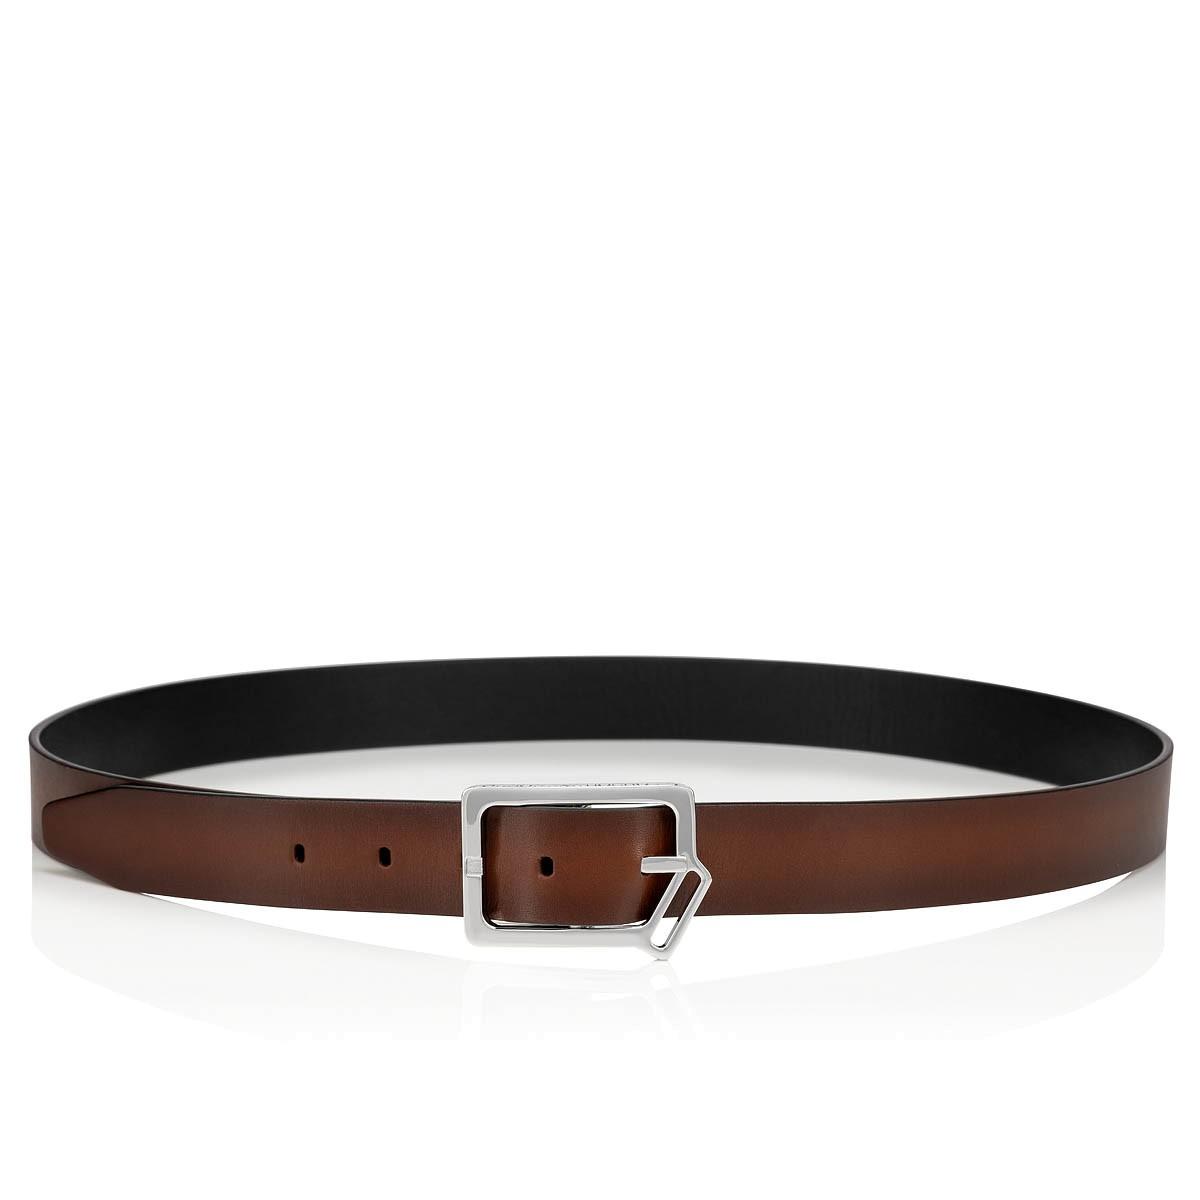 Belt - Kicko Belt - Christian Louboutin